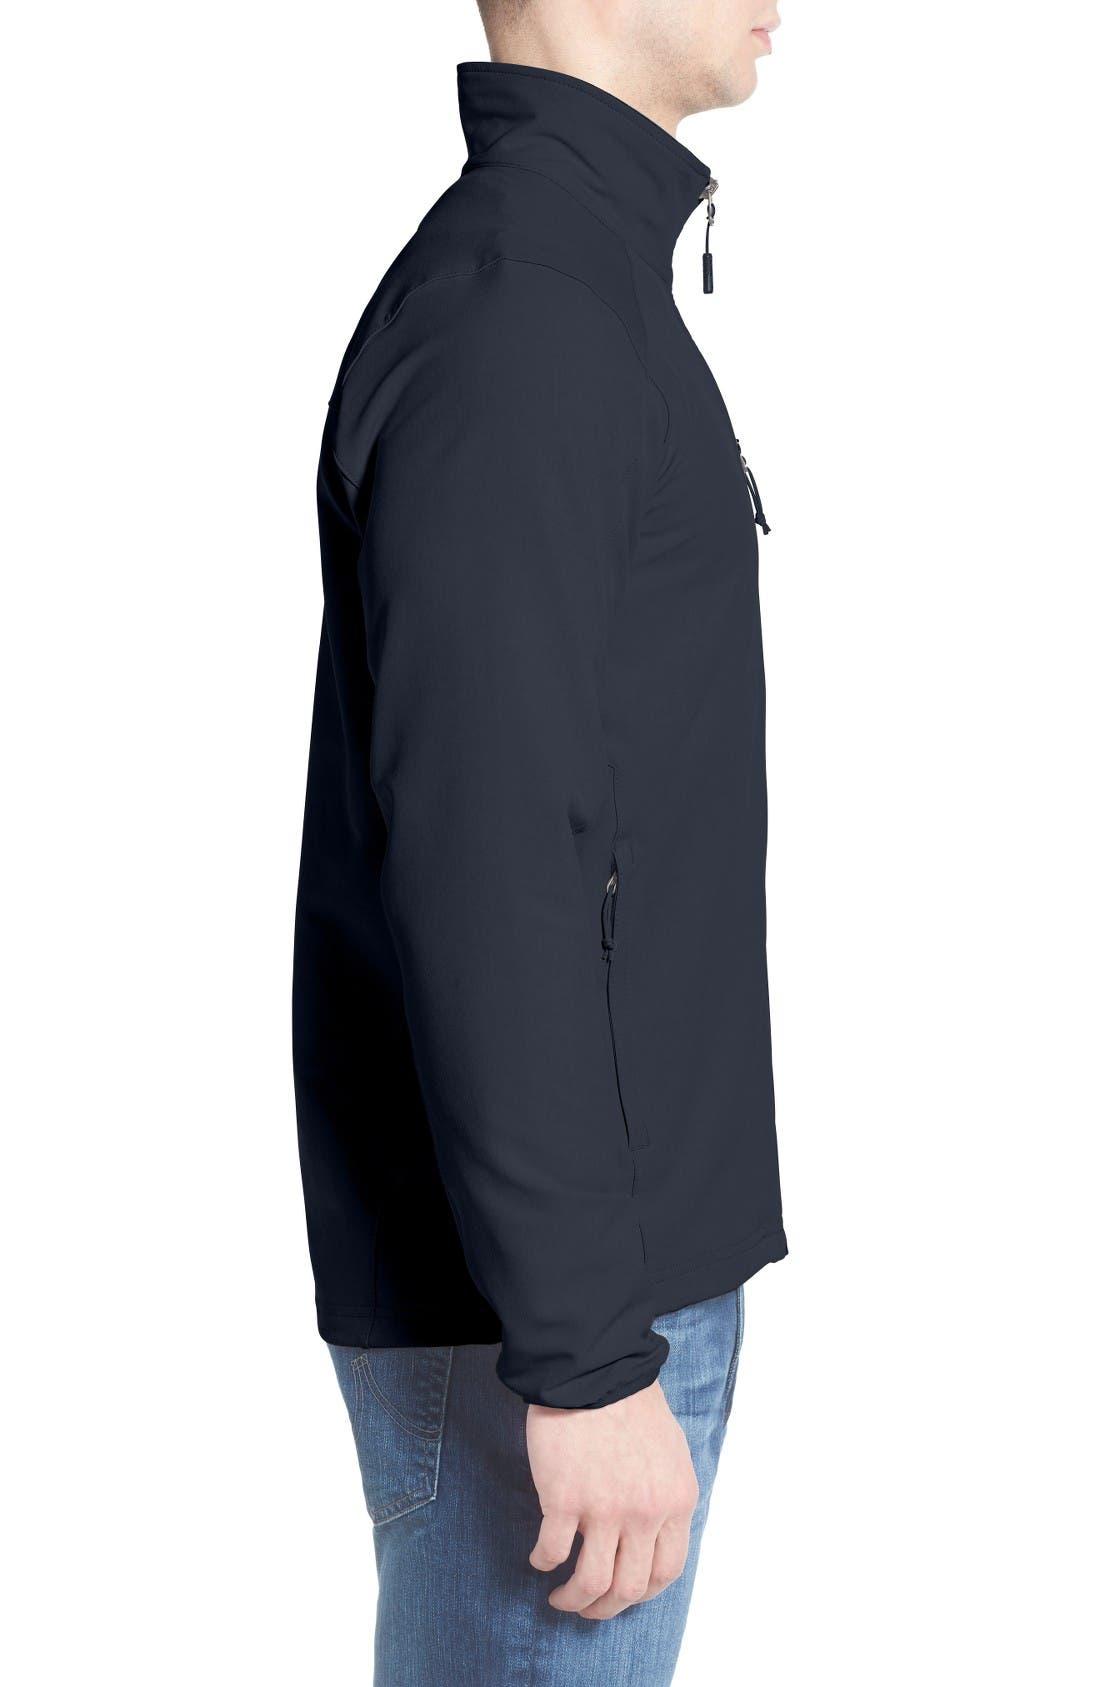 Apex Pneumatic Jacket,                             Alternate thumbnail 3, color,                             Urban Navy/ Urban Navy